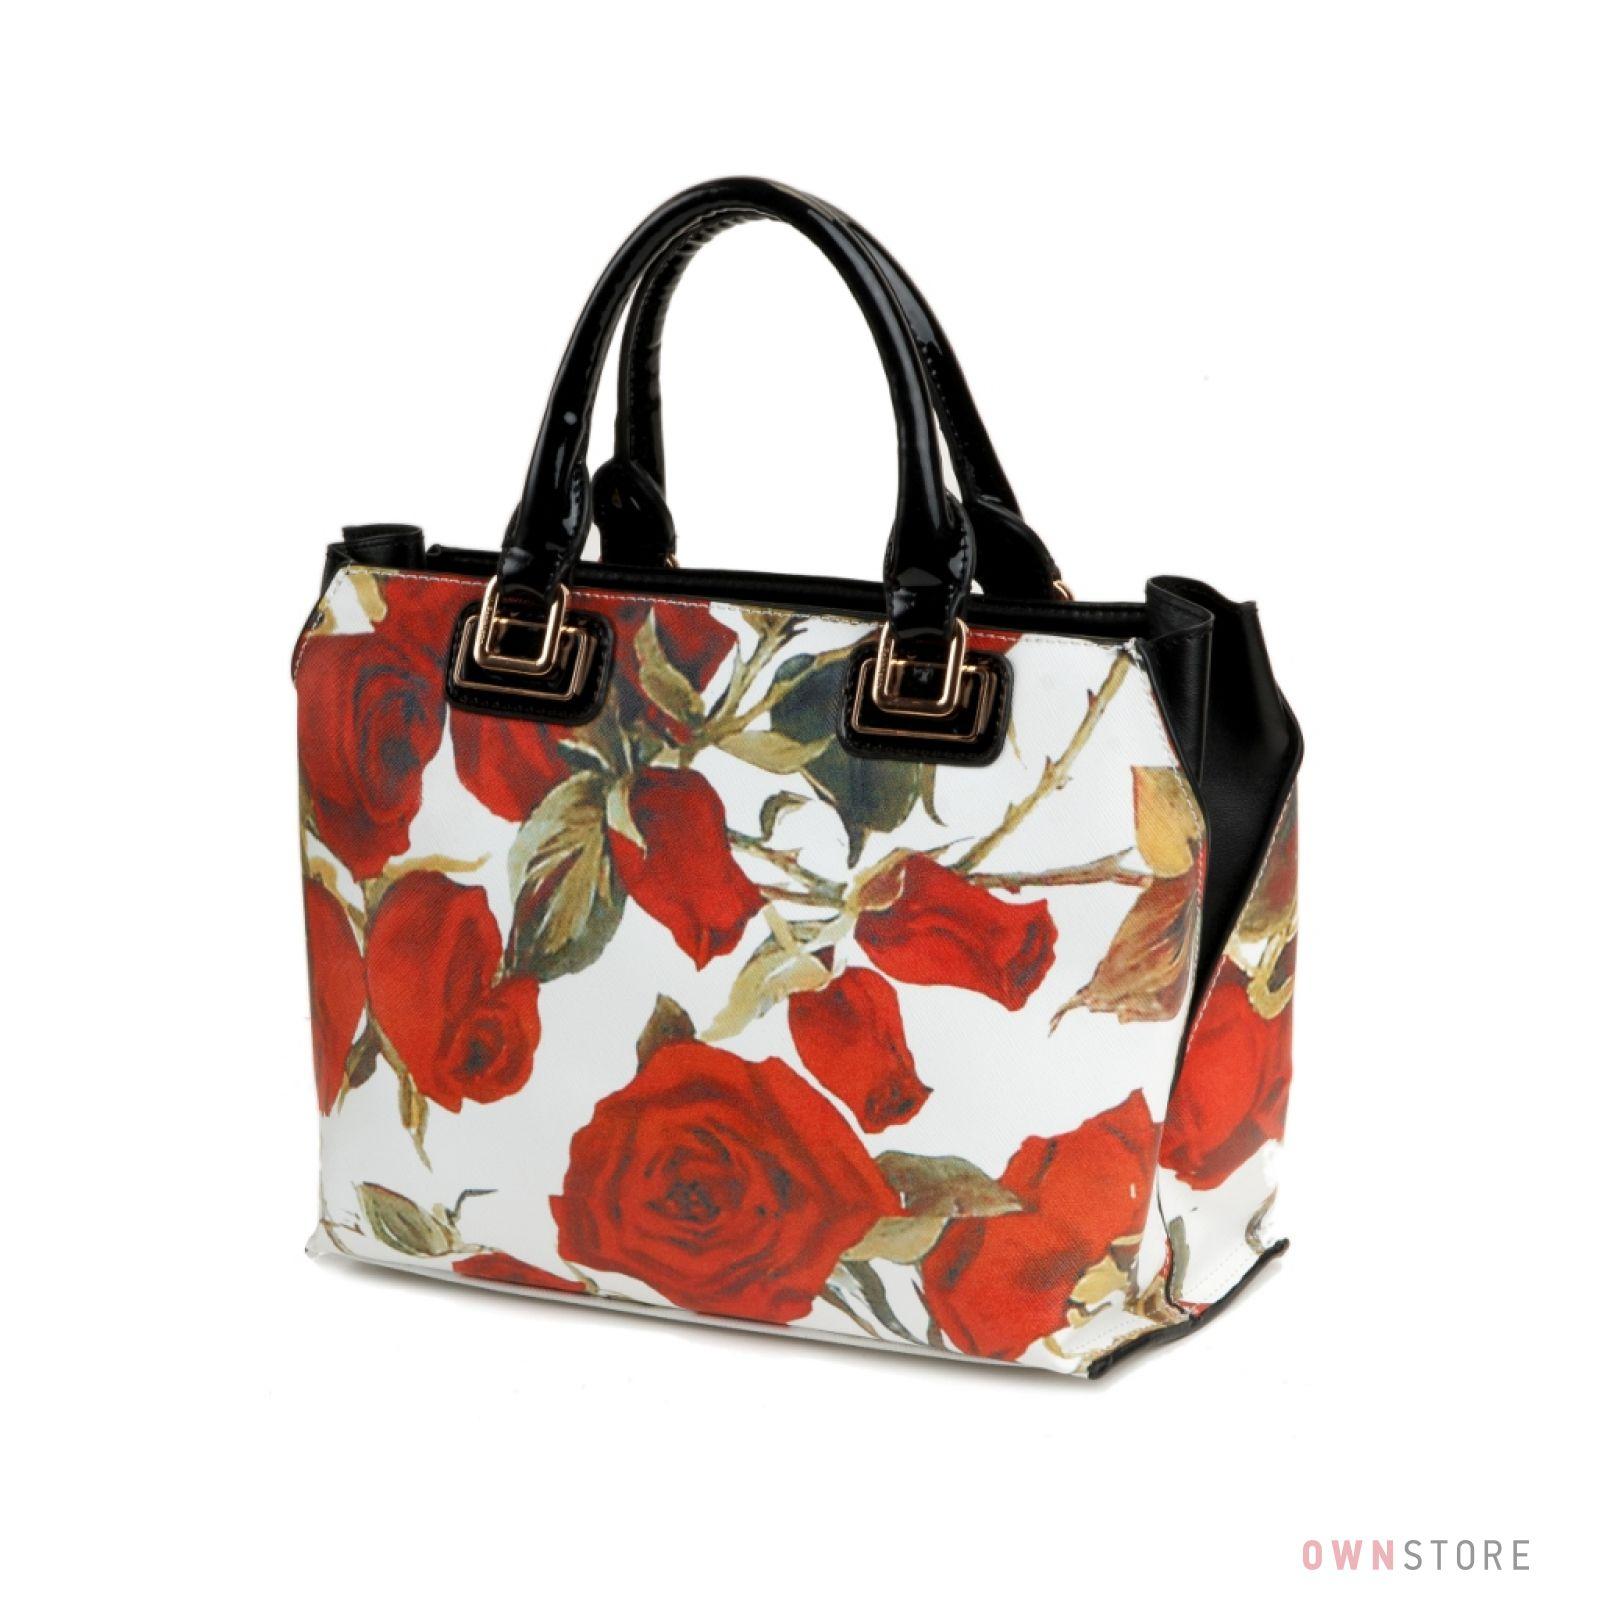 c383adaedc91 Купить сумку женскую с розами от Velina Fabbiano онлайн - арт.18087-1